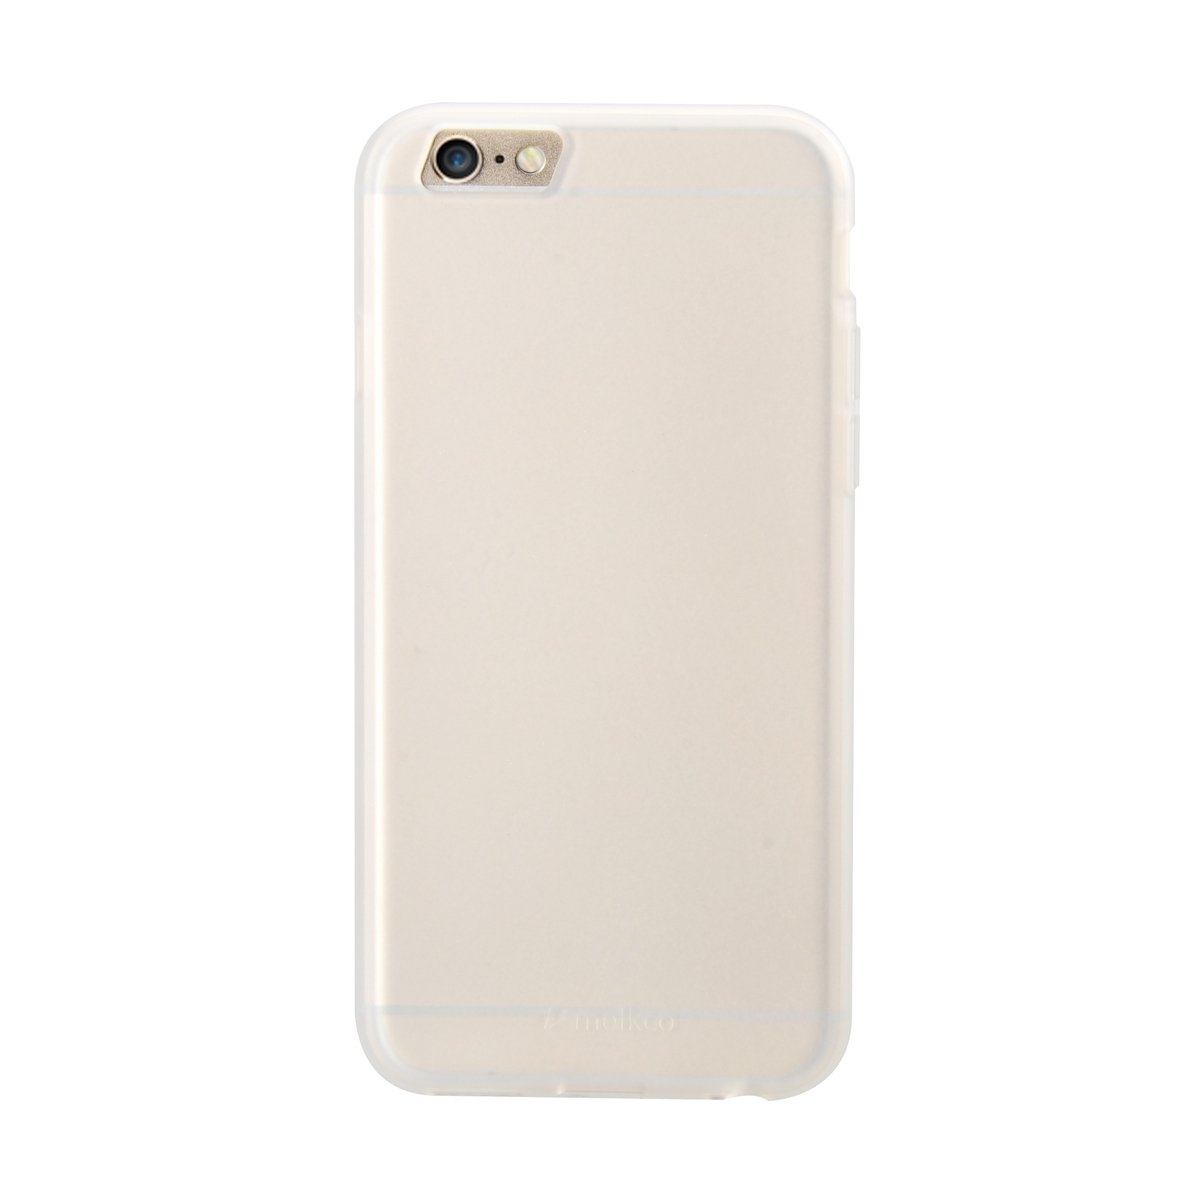 "iPhone 6 Plus/6S Plus (5.5"") Poly Jacket 手機保護殼 - 透明色(附送屏幕保護貼)"